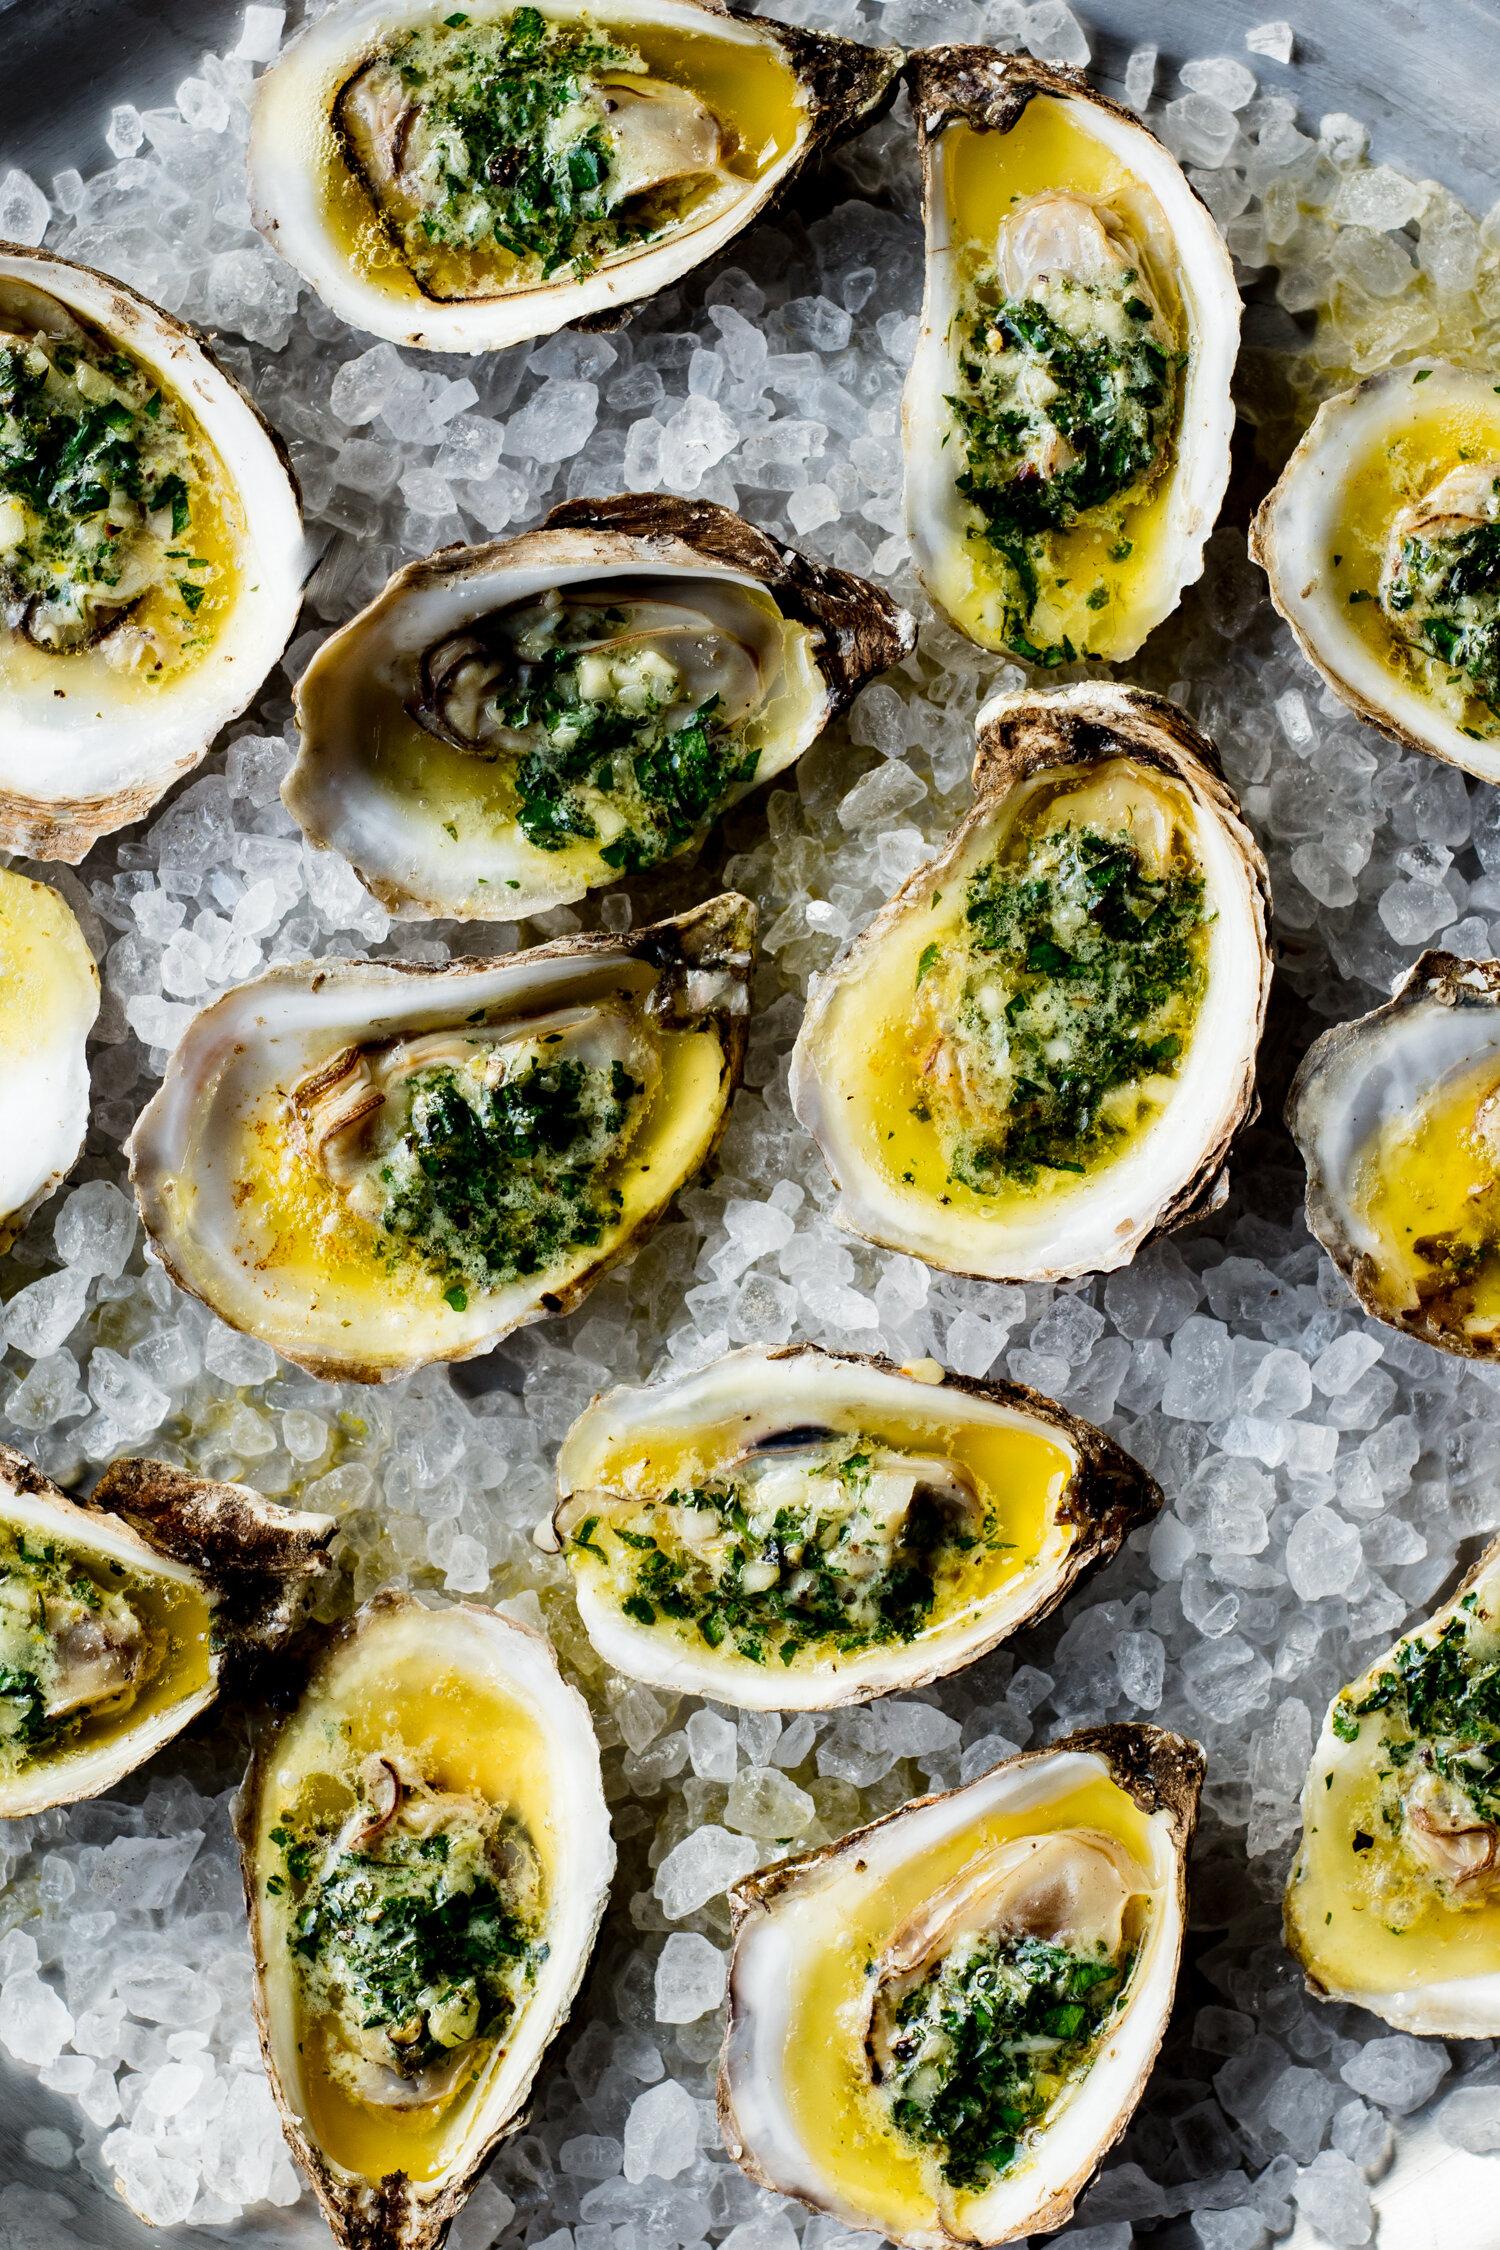 erin-scott-san-francisco-california-natural-light-editorial-food-photographer-edible-communities-broiled-oysters-on-salt-7585.jpg